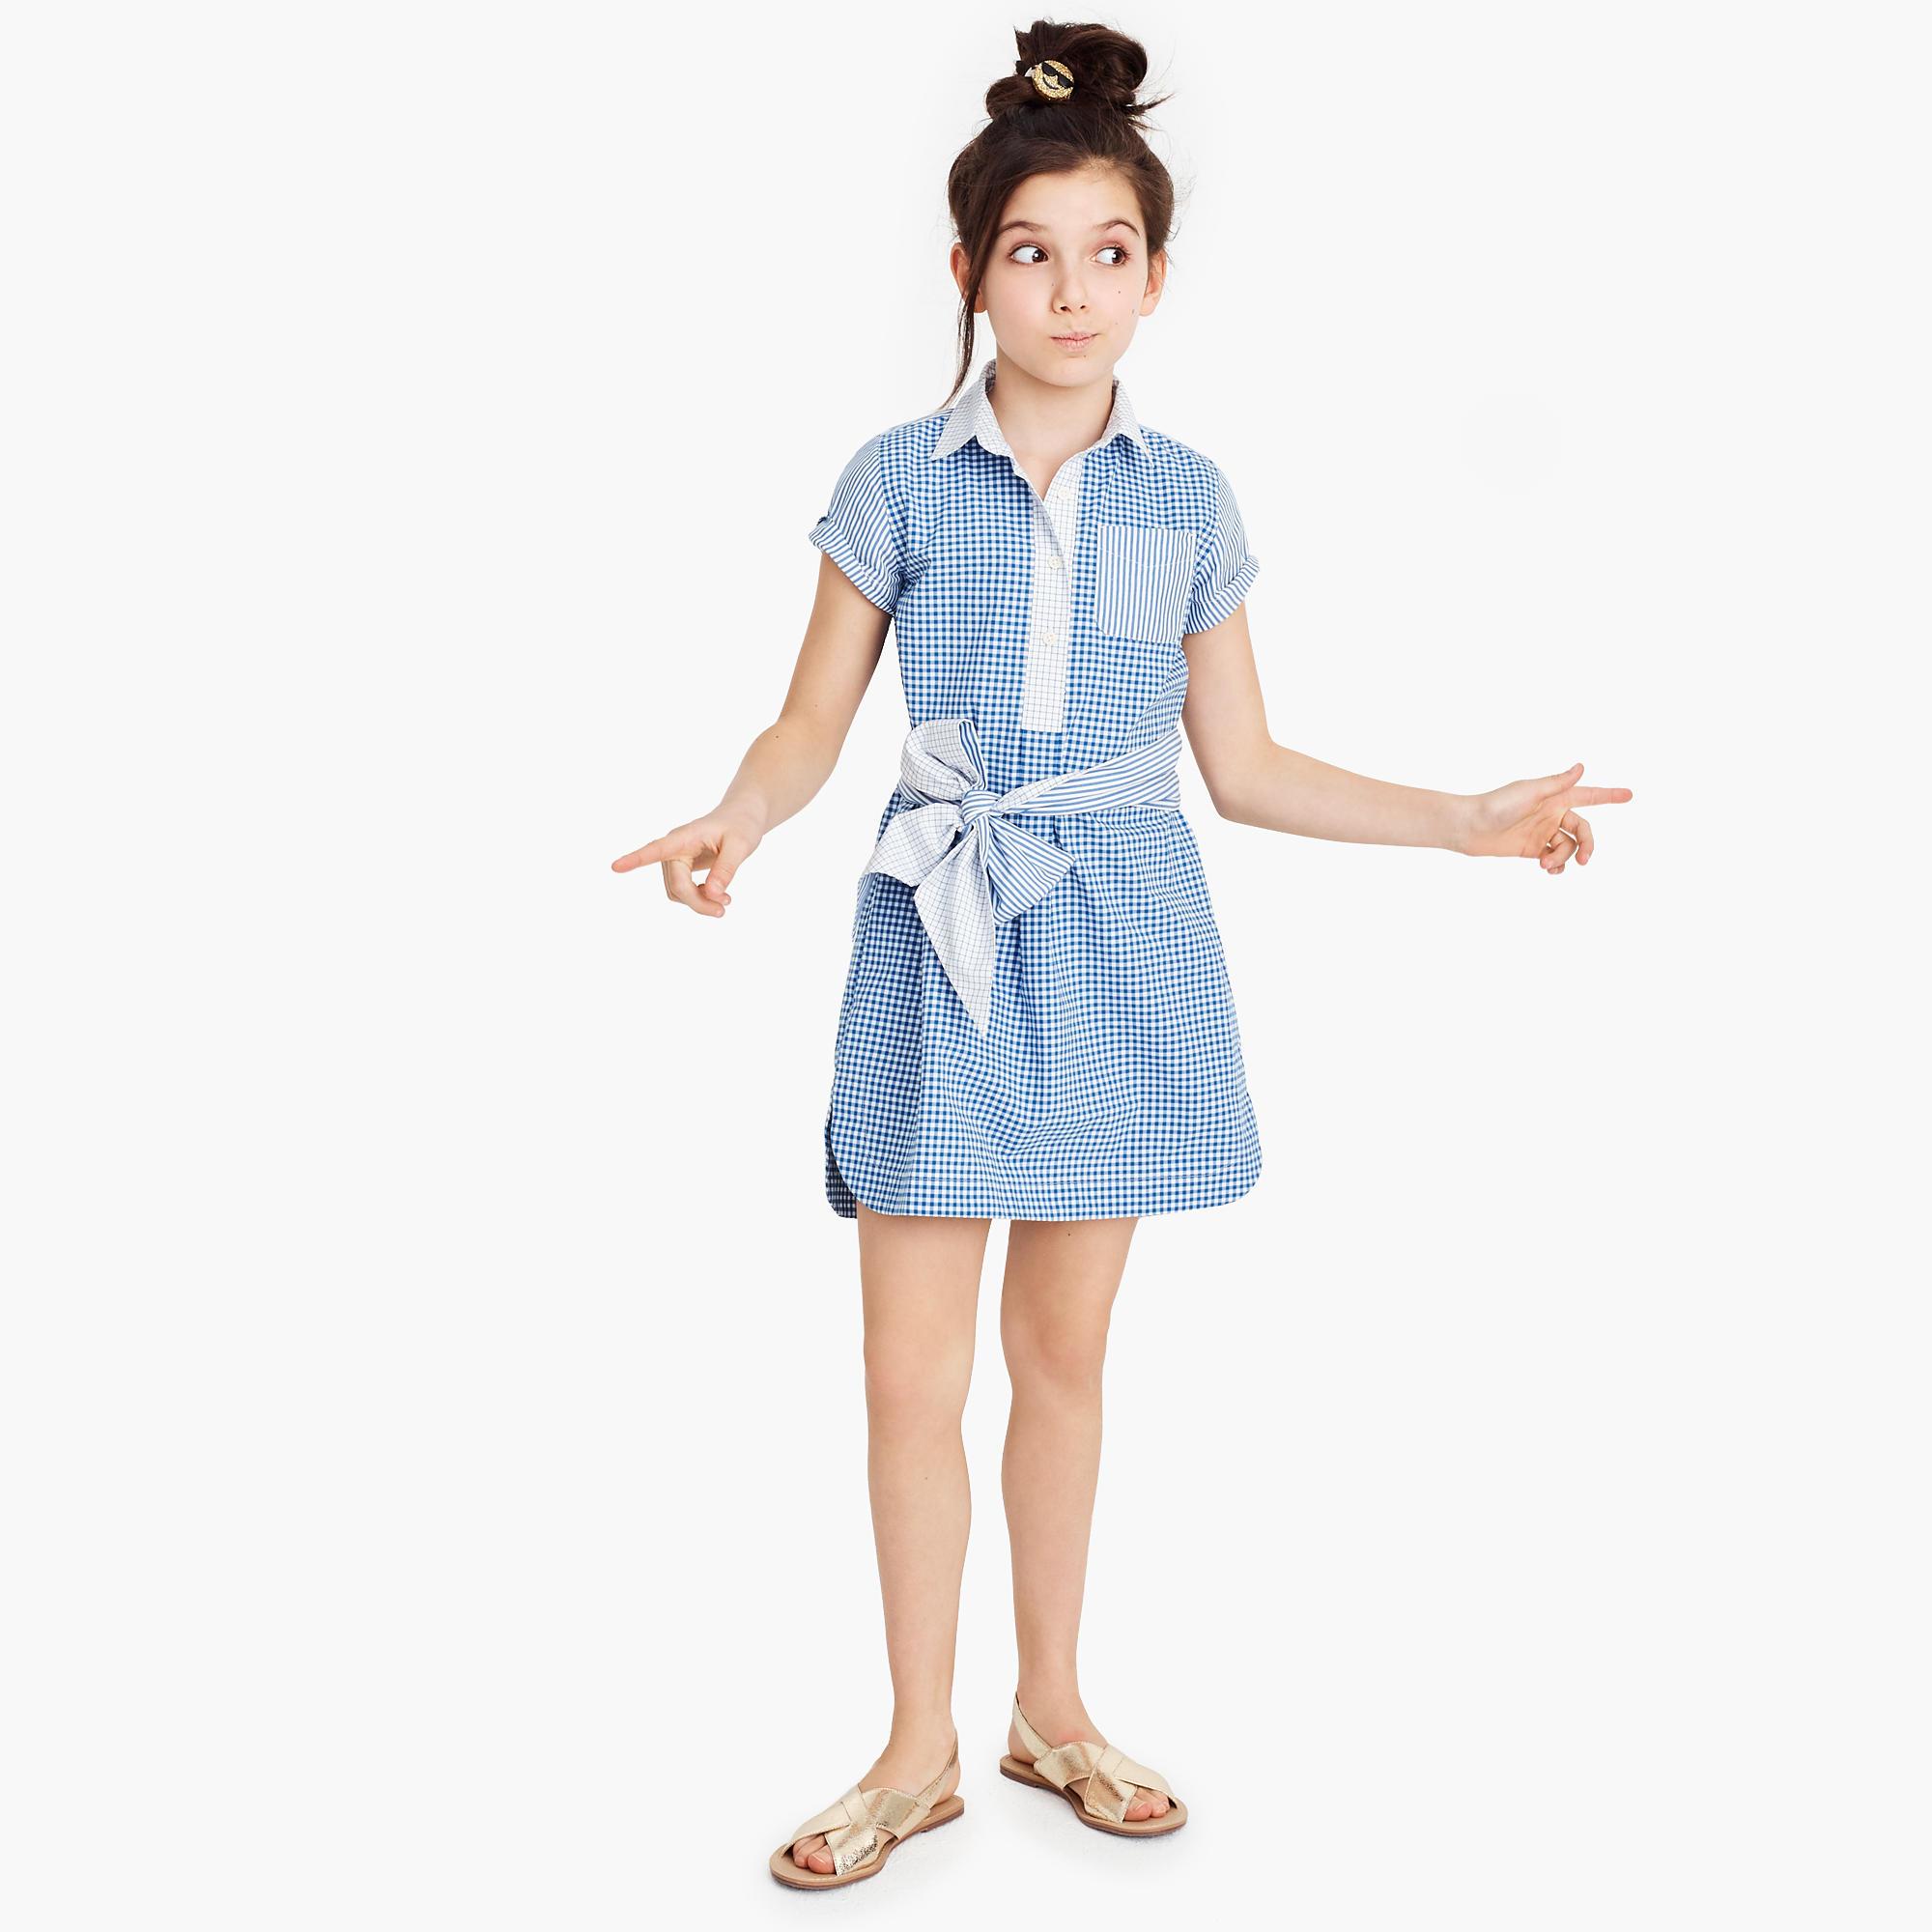 Christmas dress attire for age 57 - Girls Tie Waist Dress In Mash Up